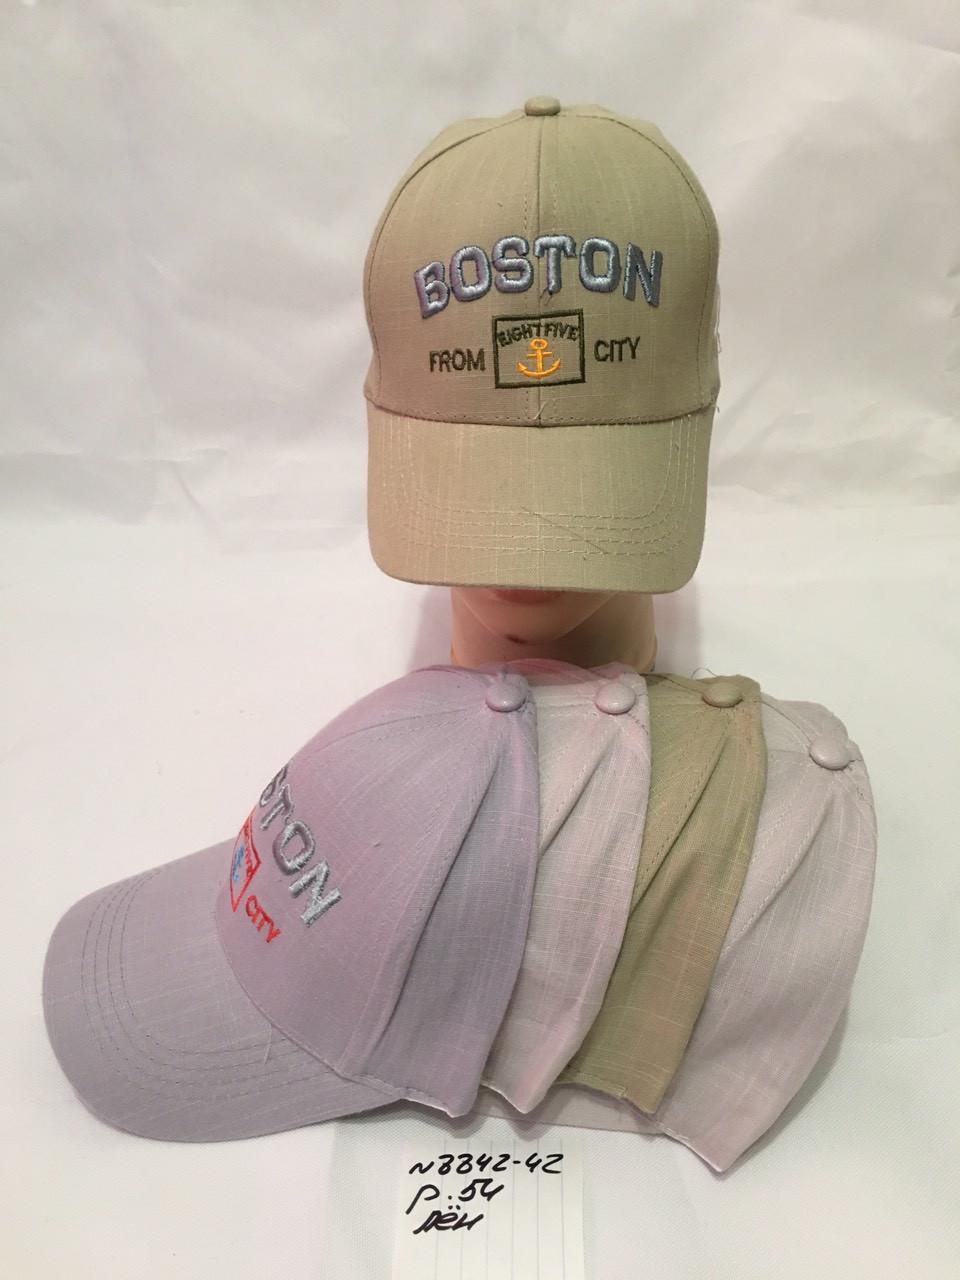 Подростковая однотонная кепка  для мальчика Boston р.54 лен